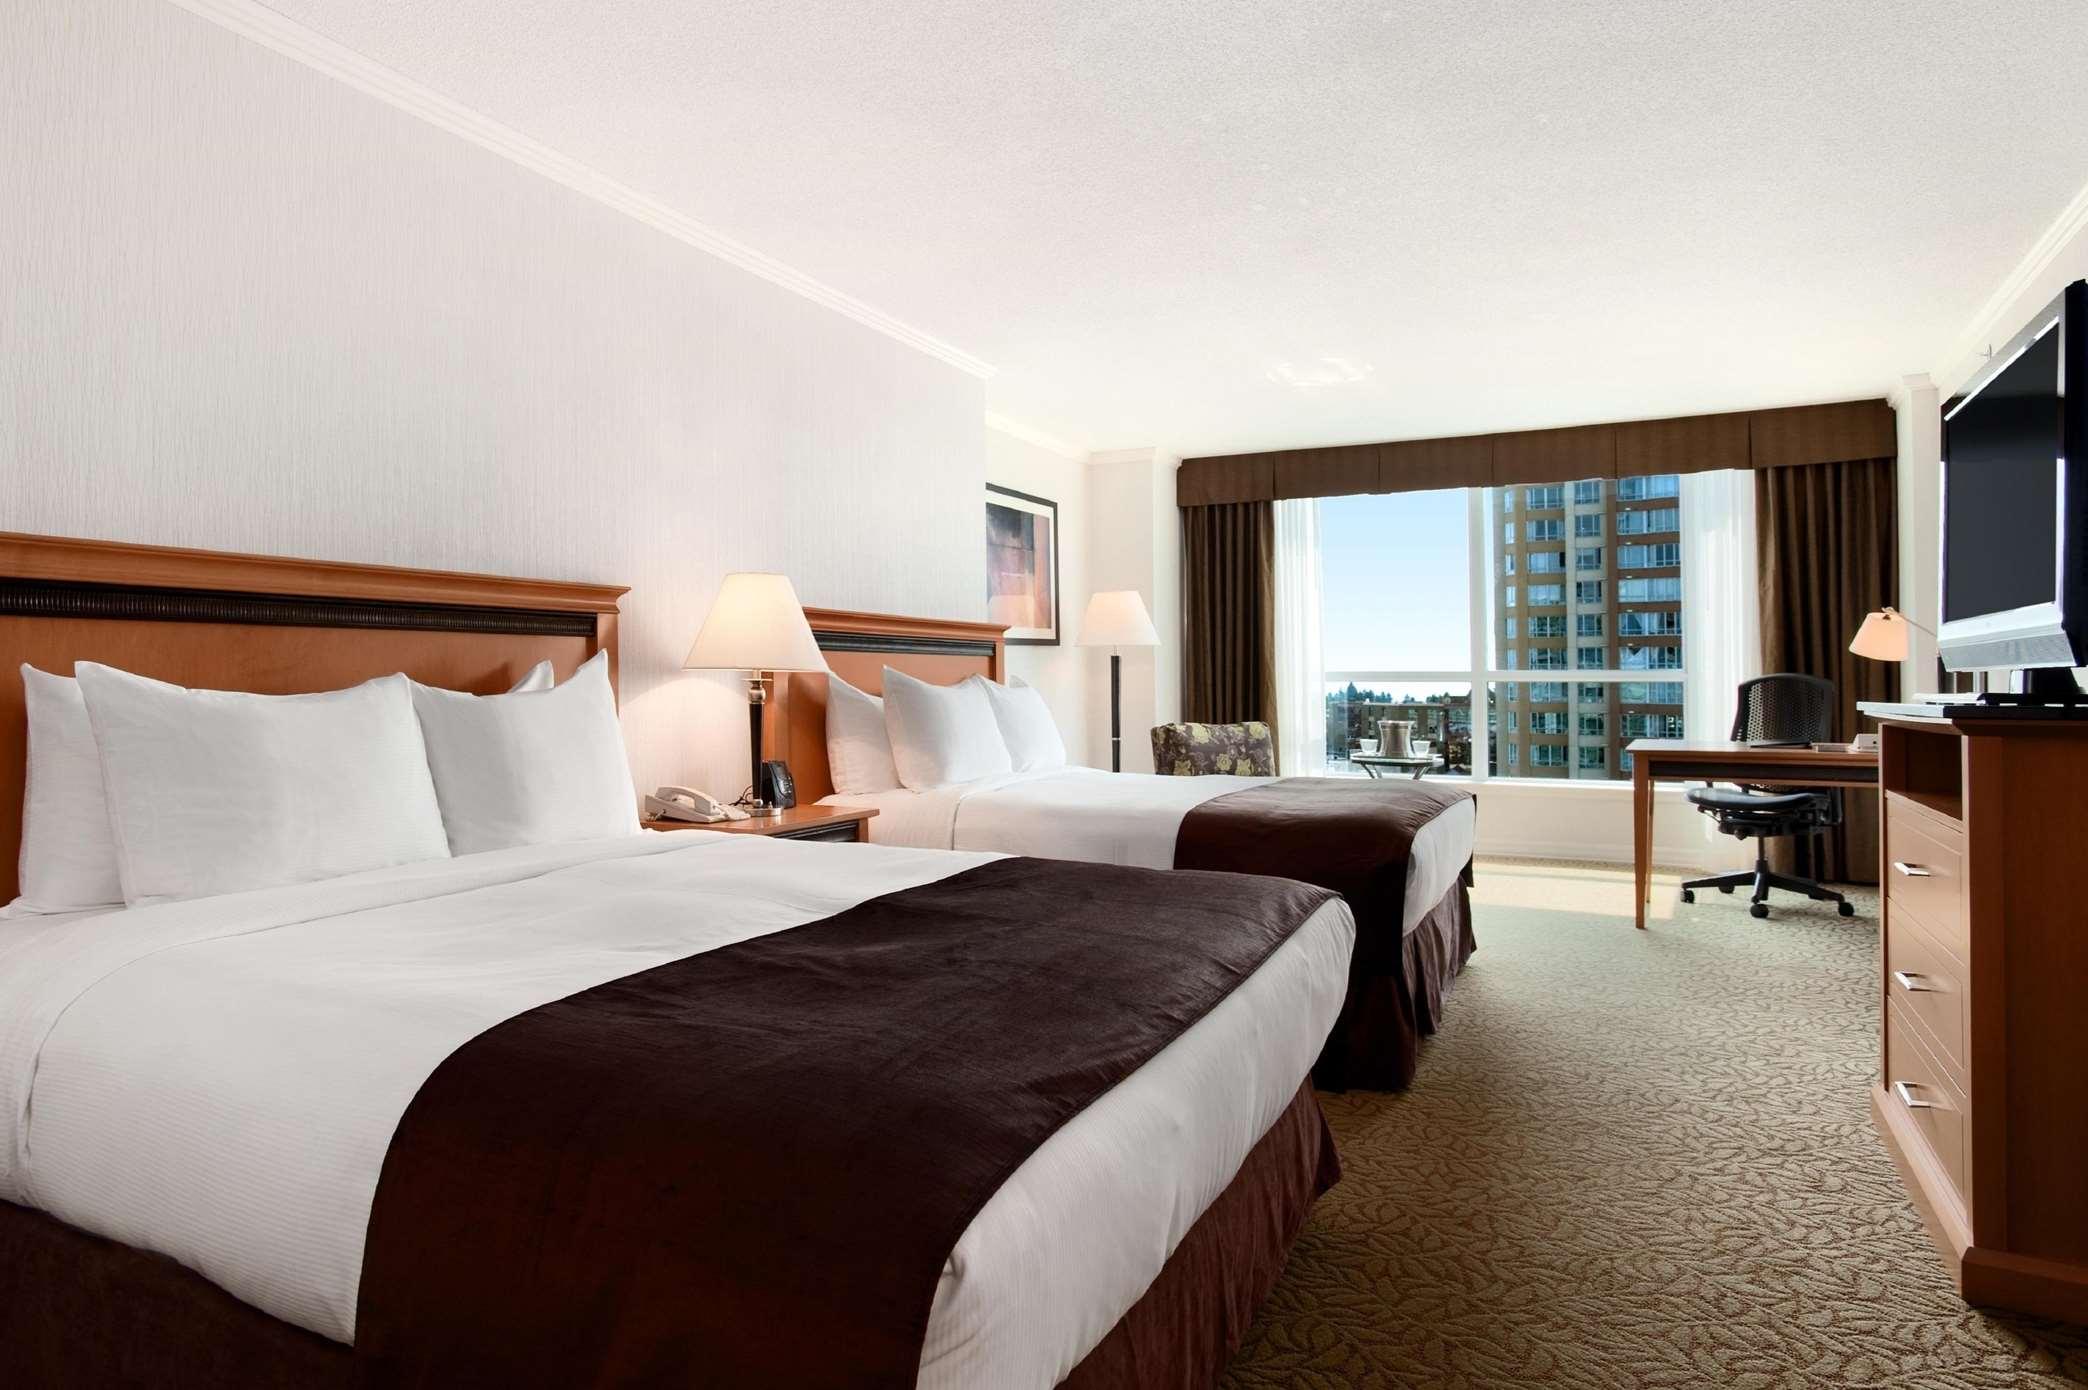 Hilton Vancouver Metrotown in Burnaby: 2 Queen Beds Deluxe Room